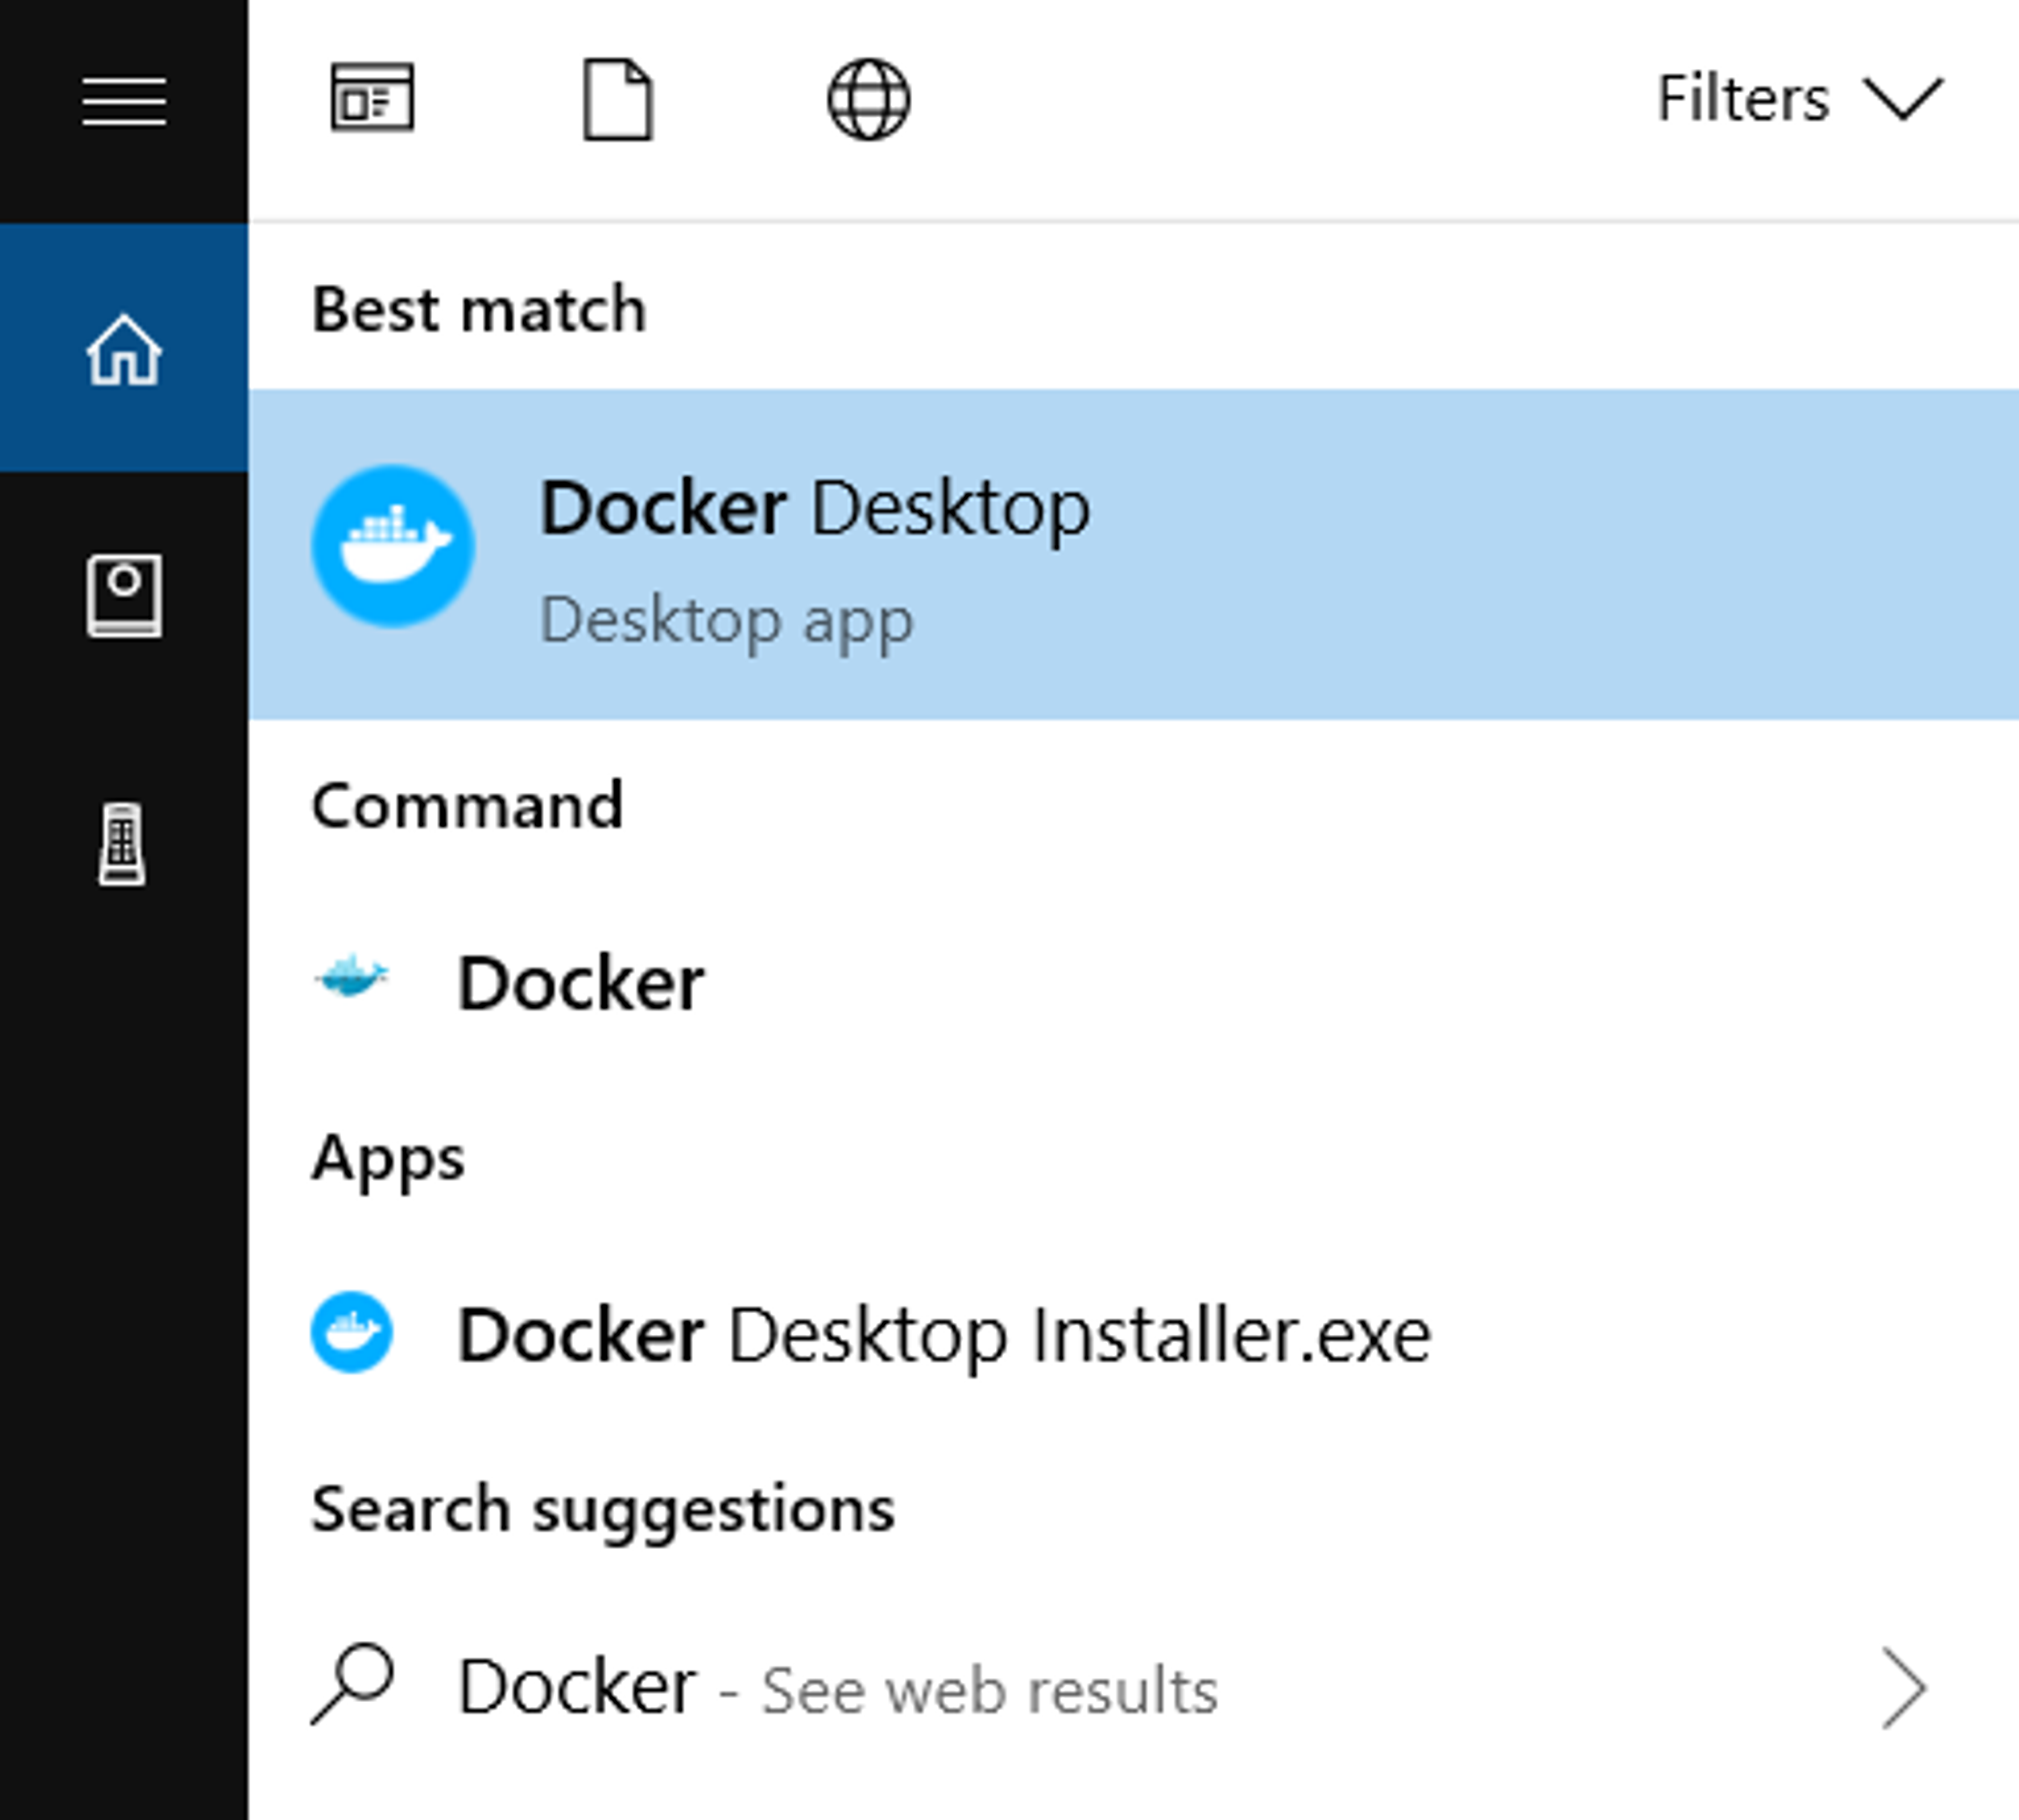 Lancer Docker Desktop depuis votre interface Windows